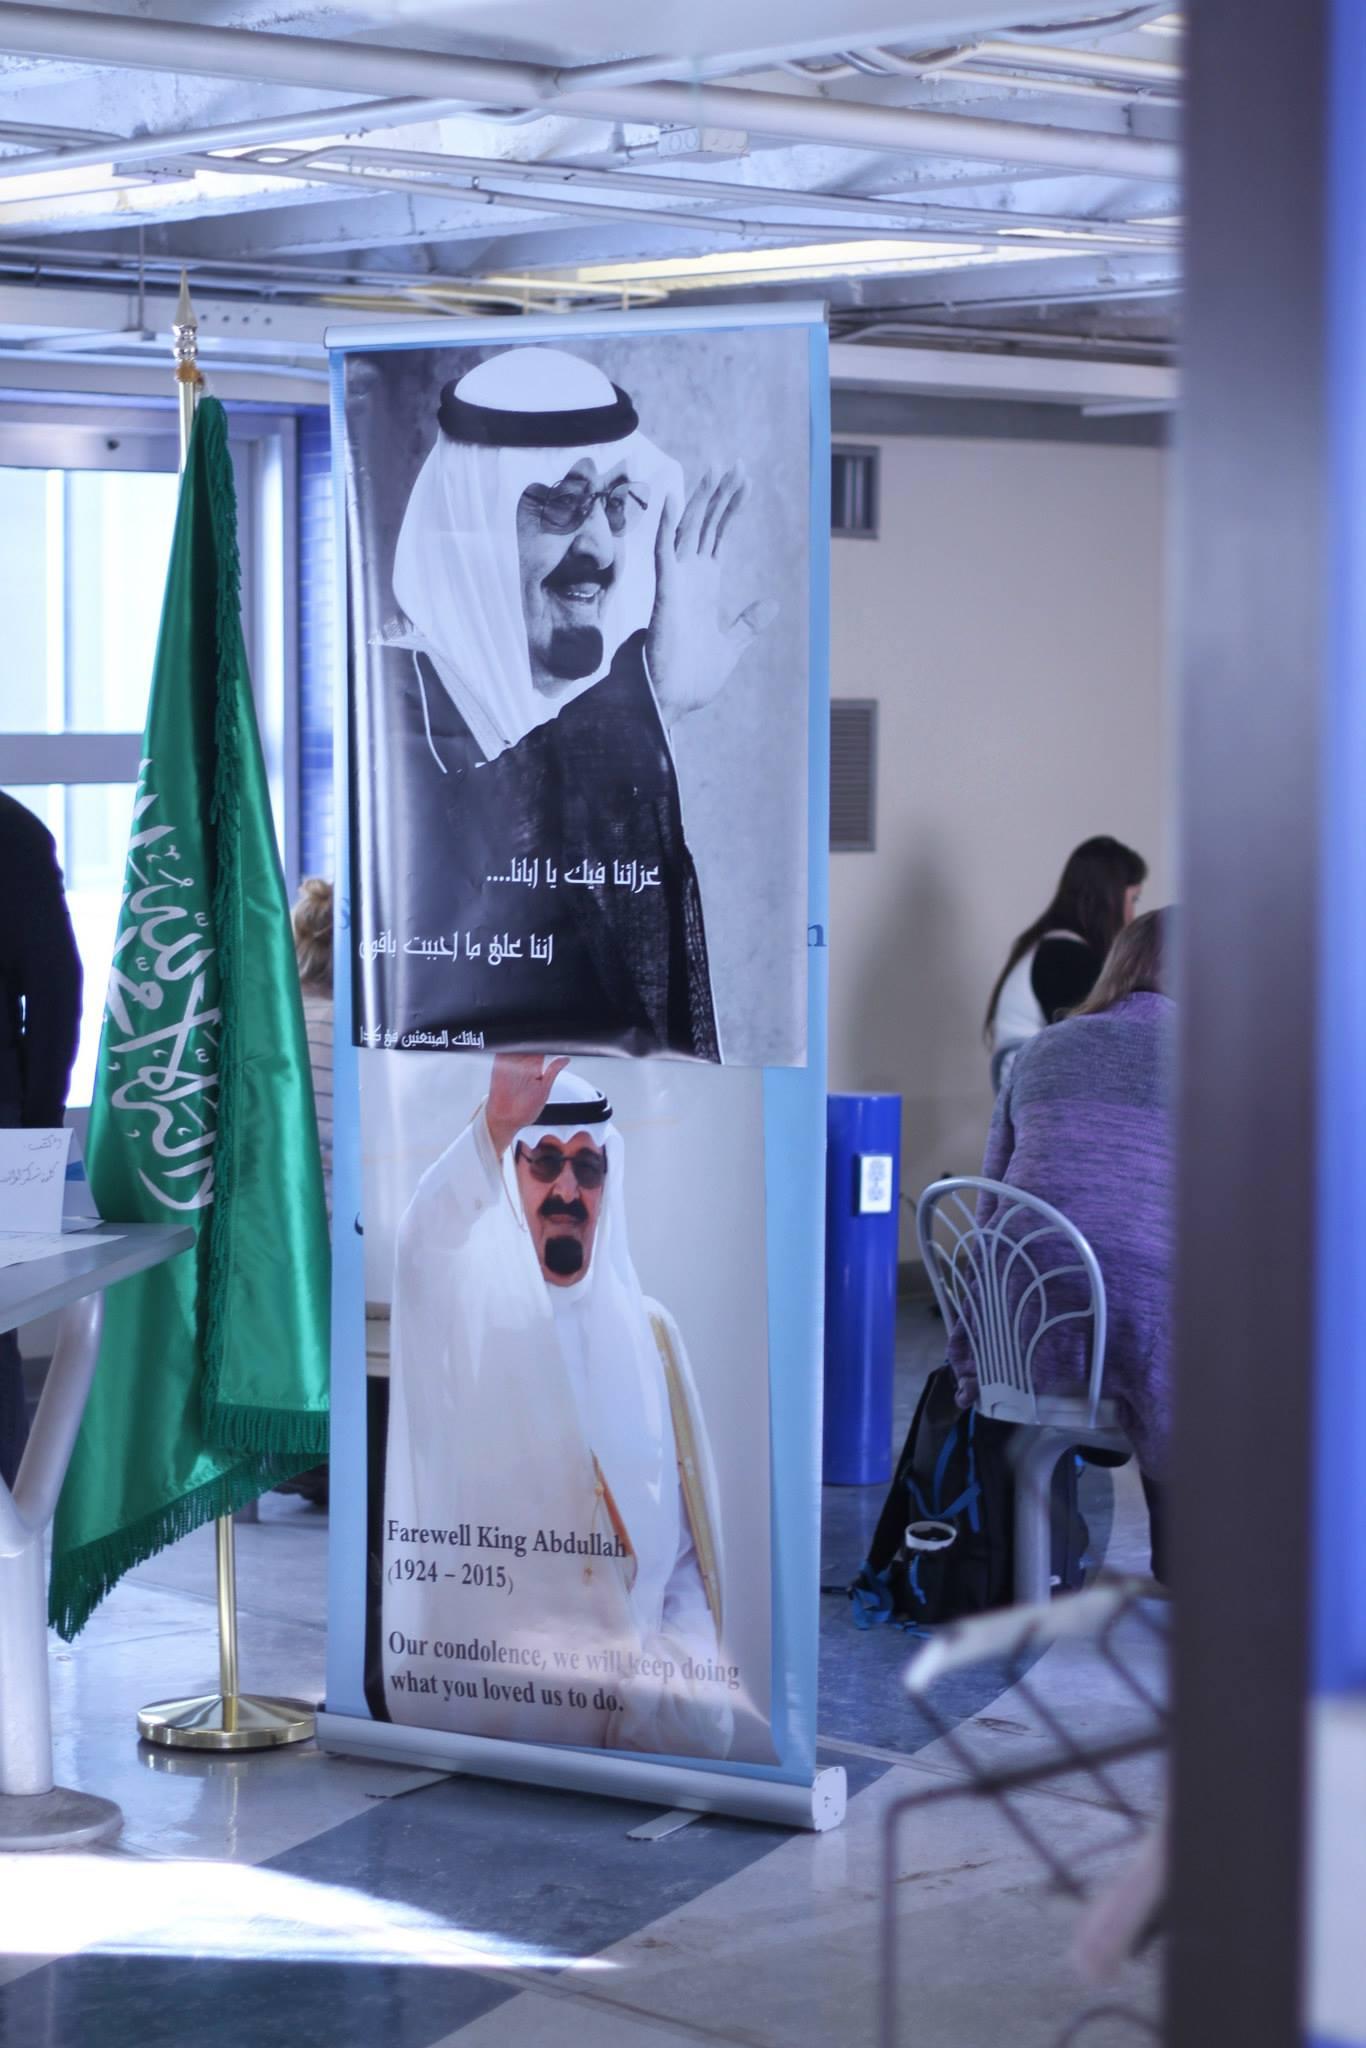 Carleton U tribute to KSA dead king